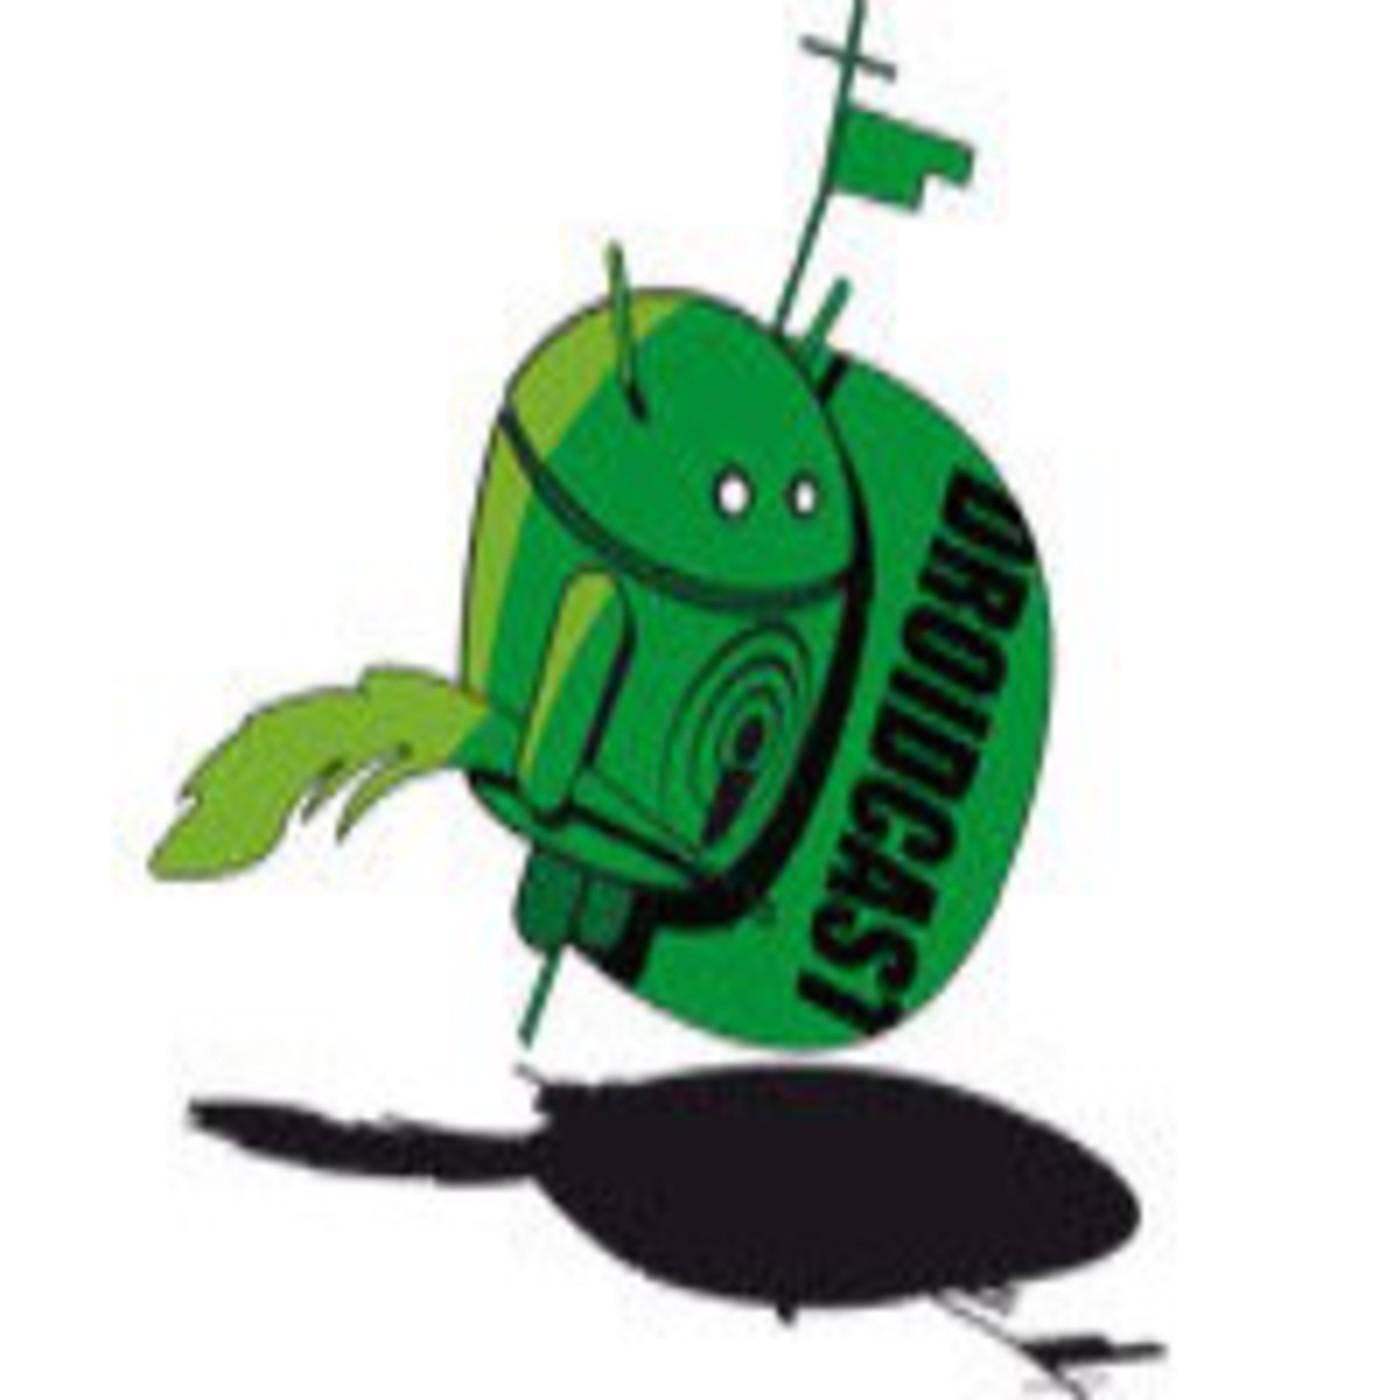 63 Droidcast Android, Nexus, Swiftkey flow, Rolletube, baterias, Jpod12